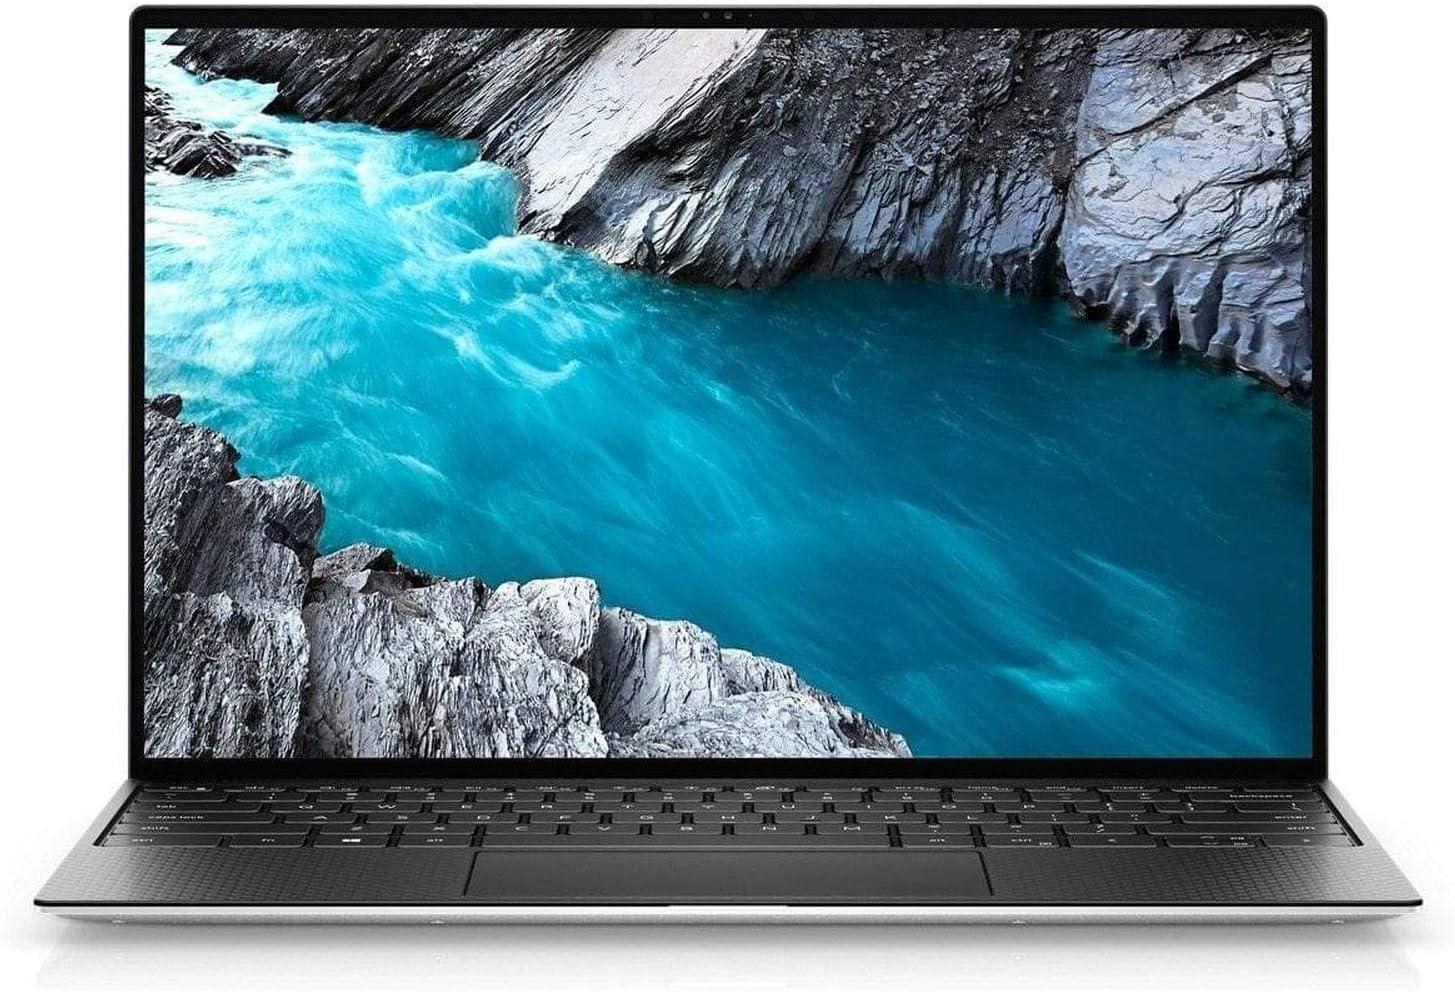 Dell XPS 9310 Laptop 13.4 - Intel Core i7 11th Gen - i7-1165G7 - Quad Core 4.7Ghz - 256GB SSD - 8GB RAM - 1920x1200 FHD+ Touchscreen - Windows 10 Home